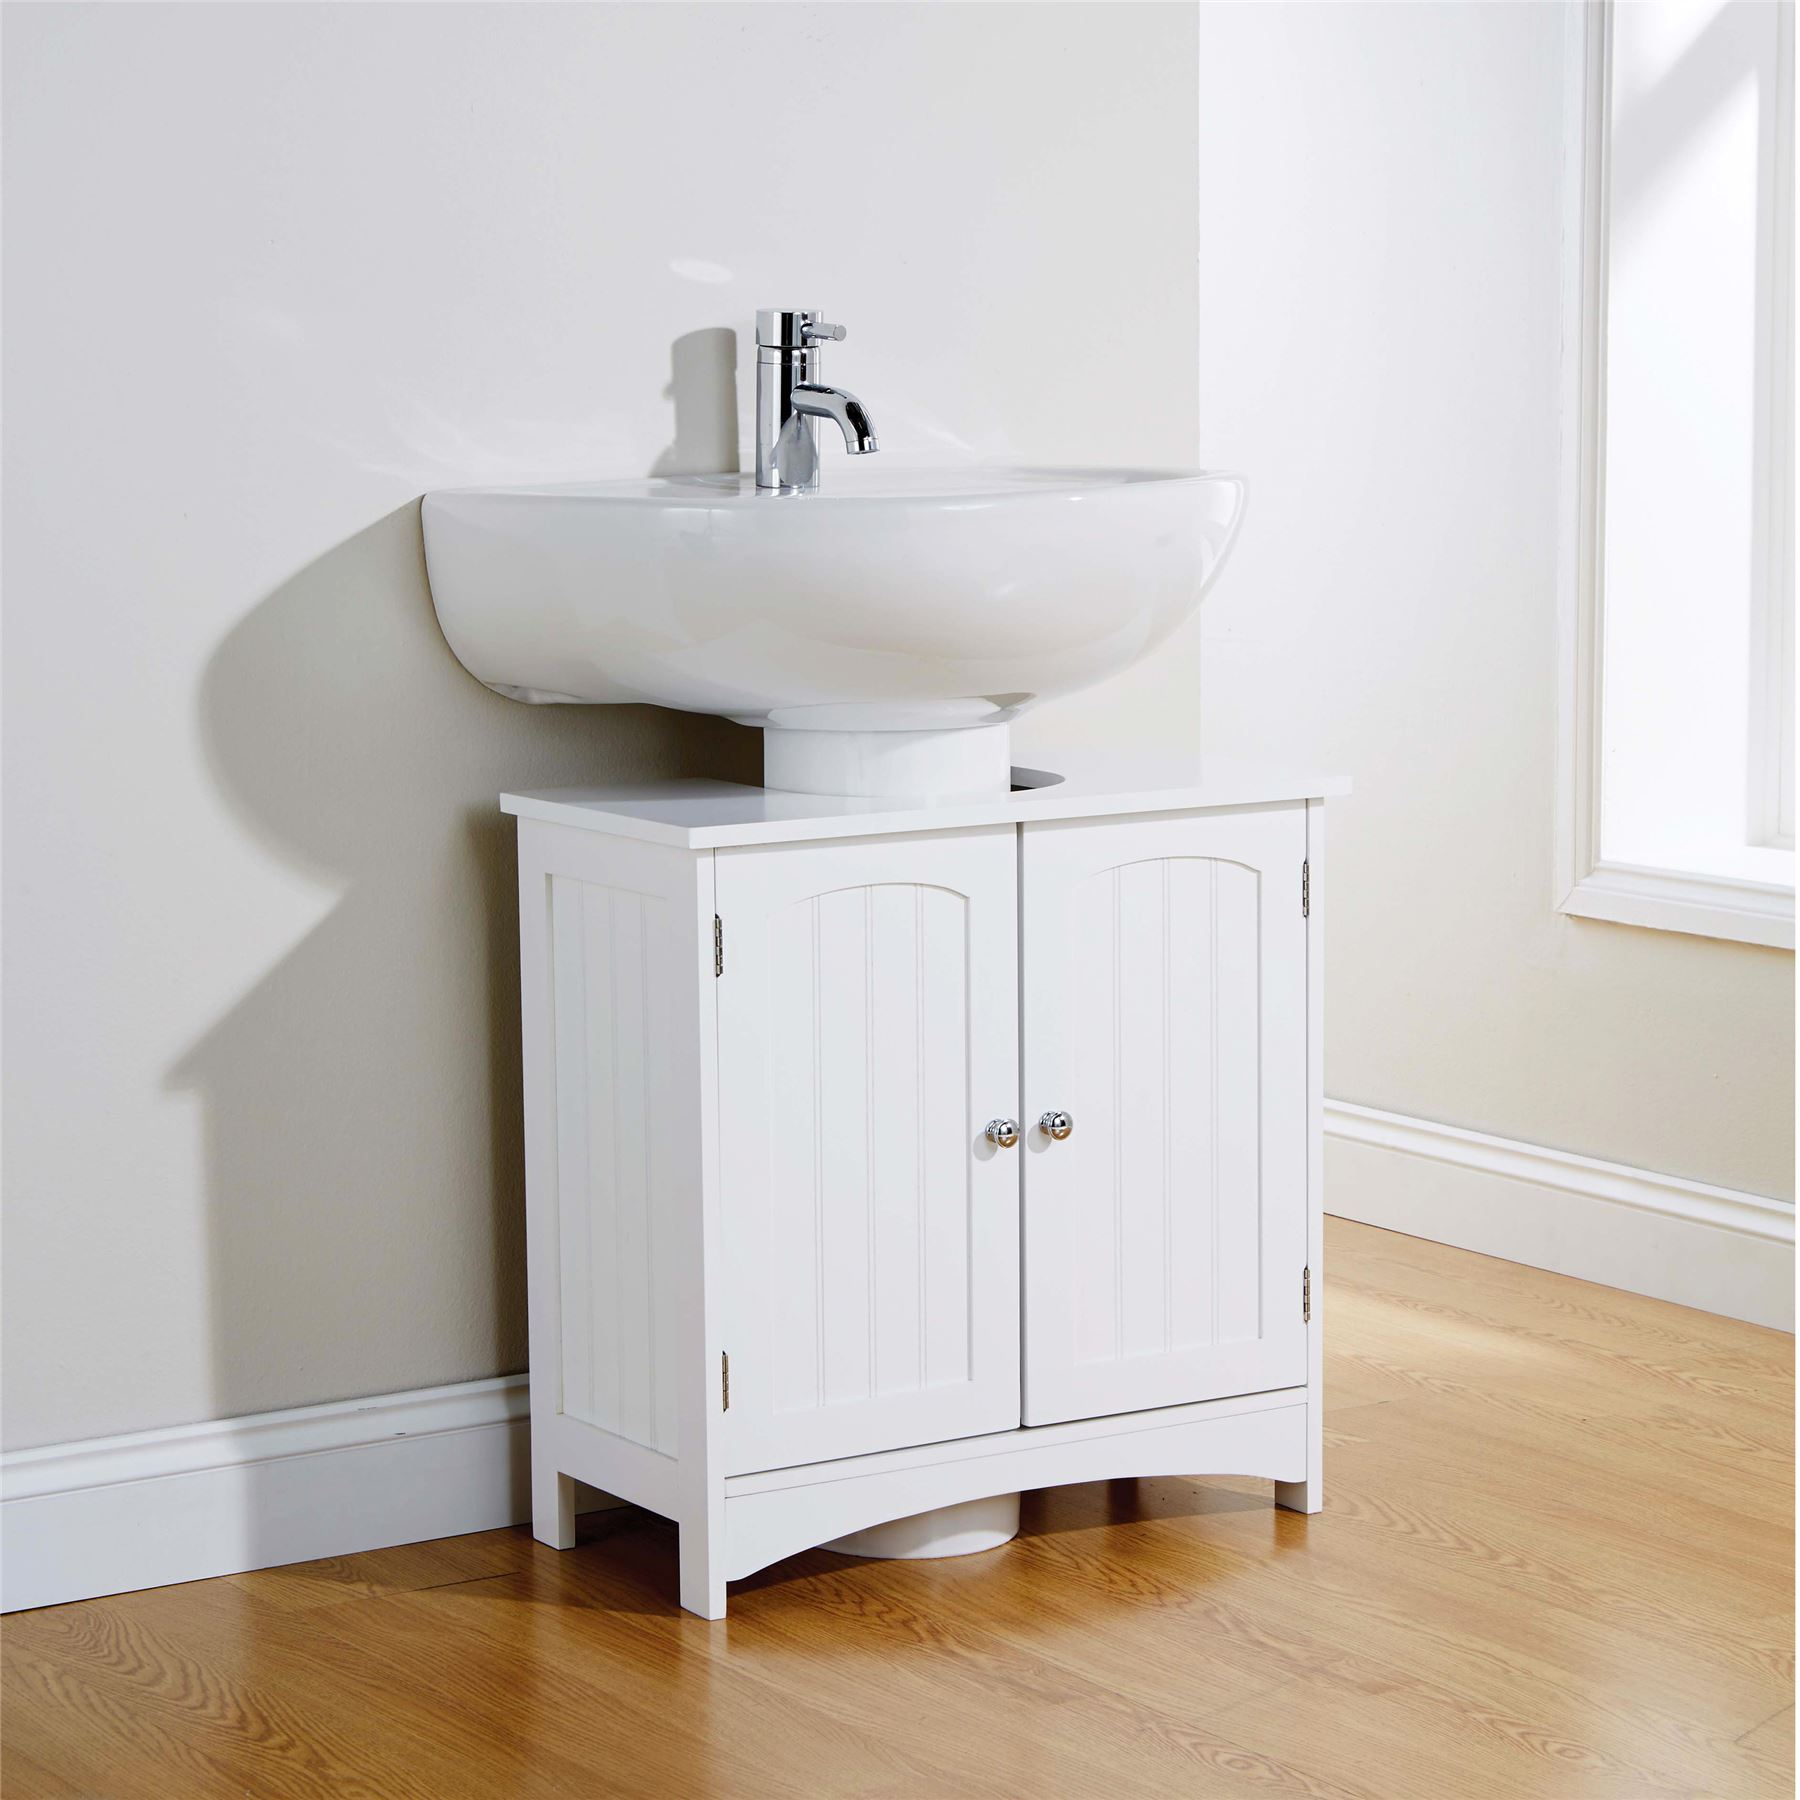 Colonial range bathroom furniture cupboard under basin for Bathroom cabinets under basin